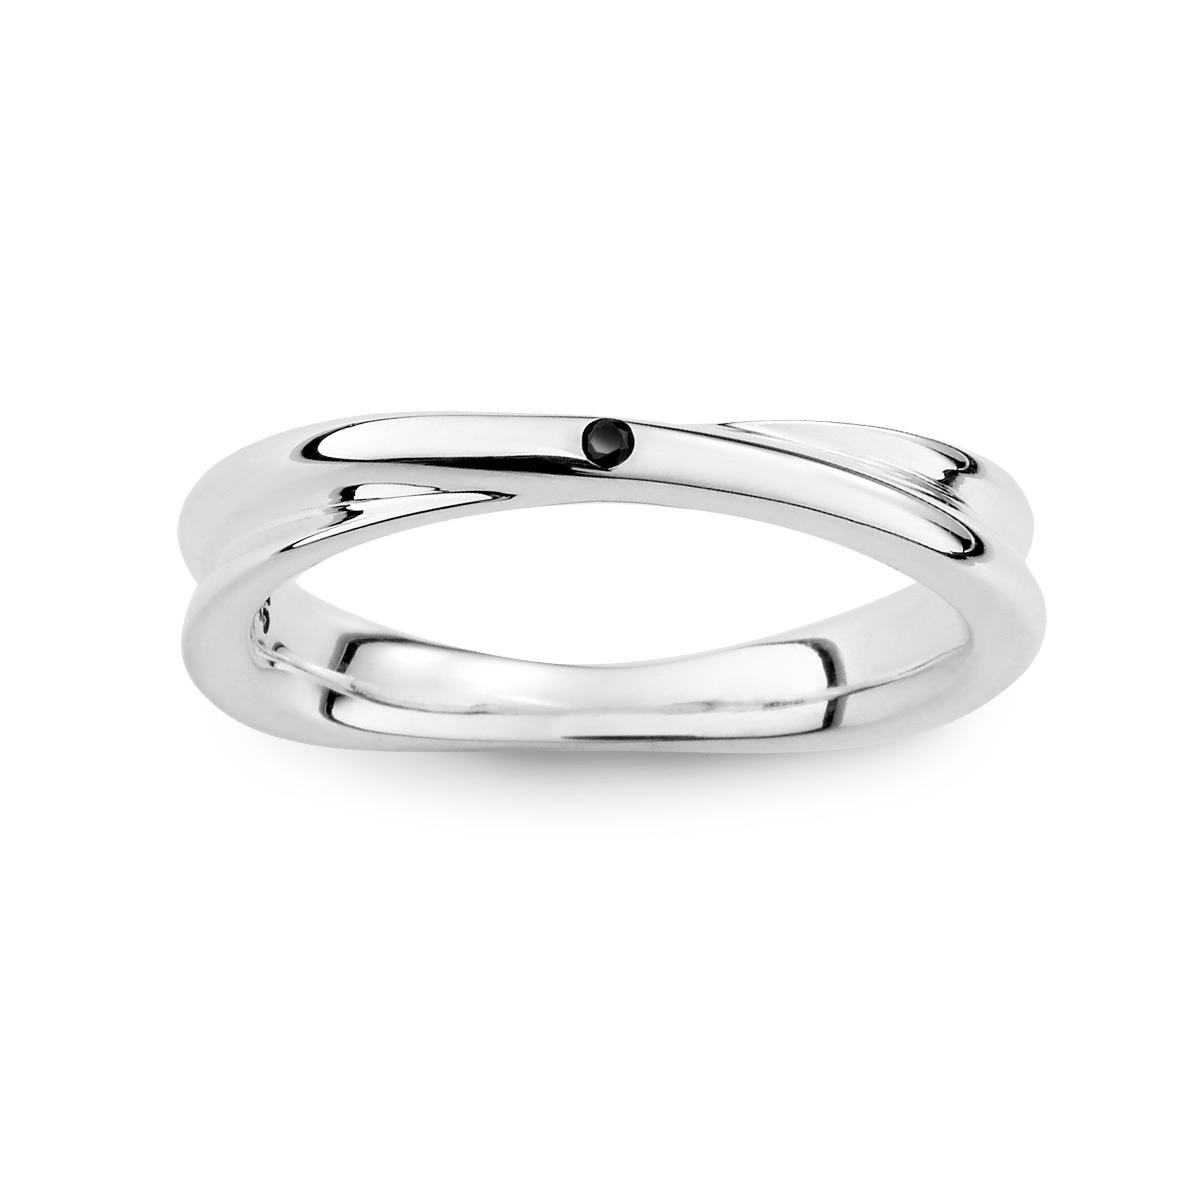 KSM117 經典素面單鑽交叉純銀戒指